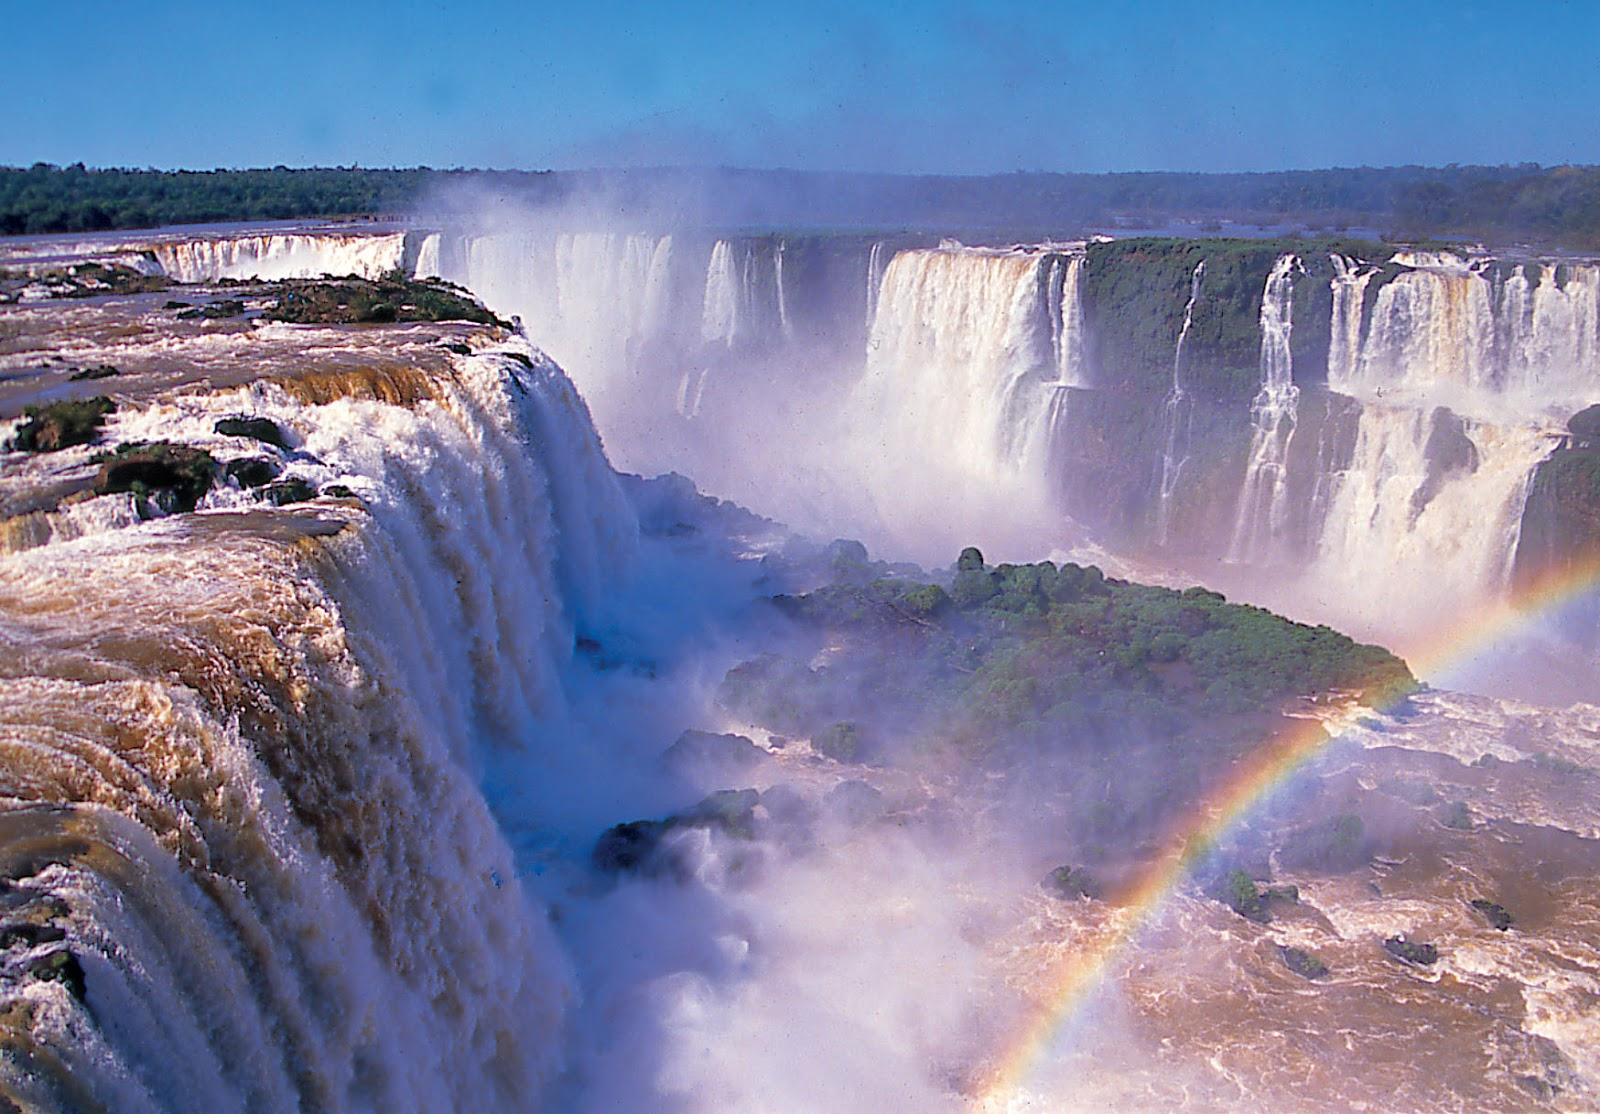 http://1.bp.blogspot.com/-V-RwkTPDyvU/T3GNJZoPiOI/AAAAAAAAIWw/zvrft_YSZ34/s1600/iguazu-falls1.jpg